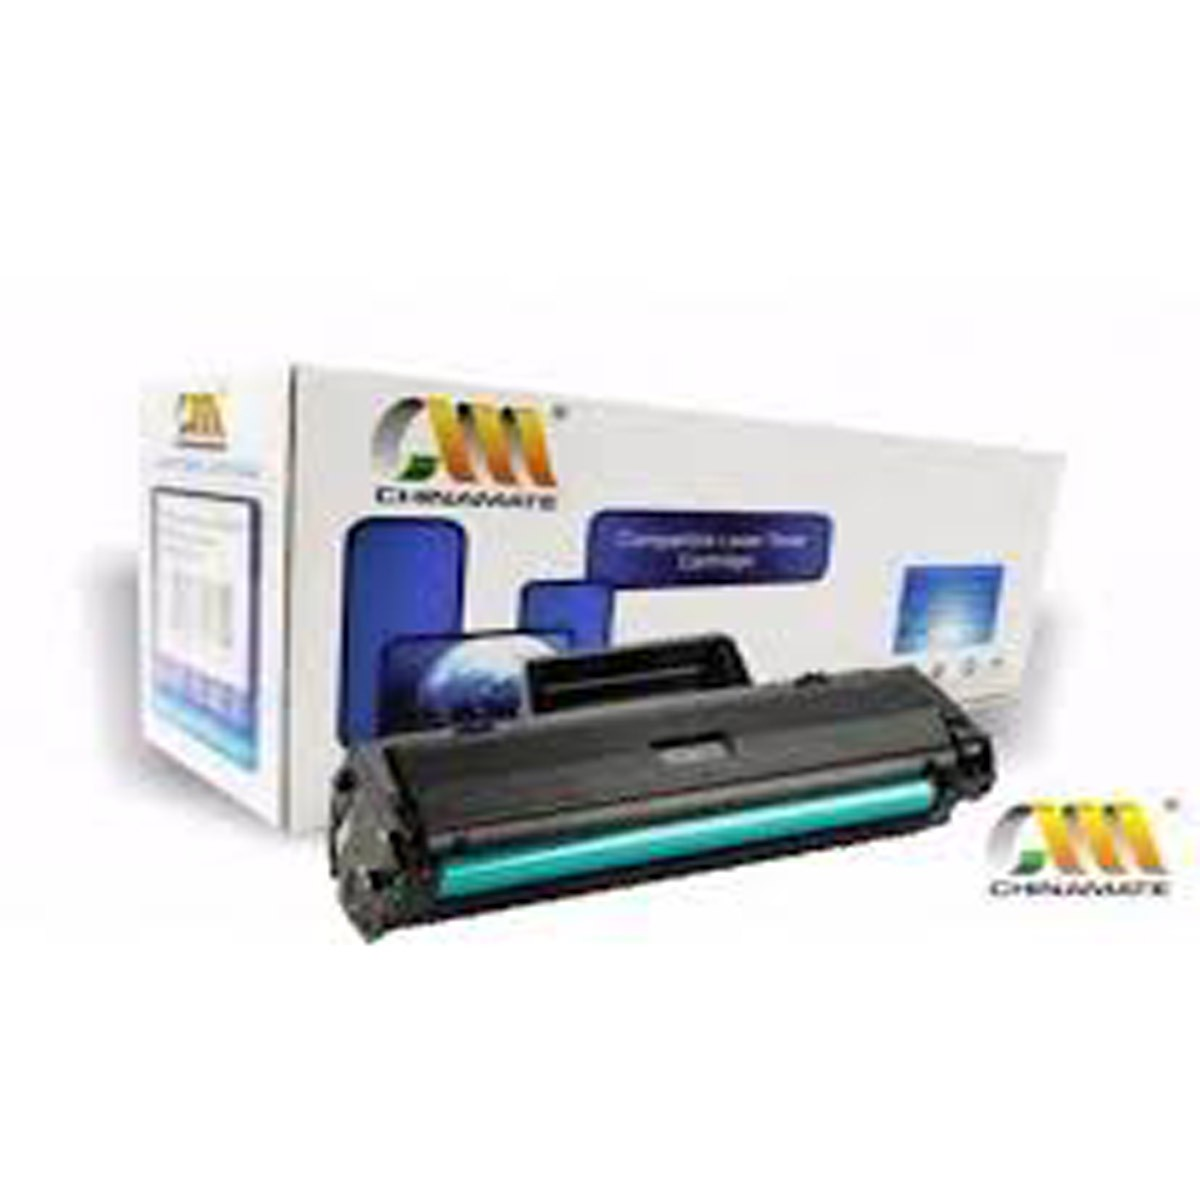 Toner Compatível HP 105A W1105A SEM CHIP - 107A 107W 135A 135W 5B-4YIY-DEN6